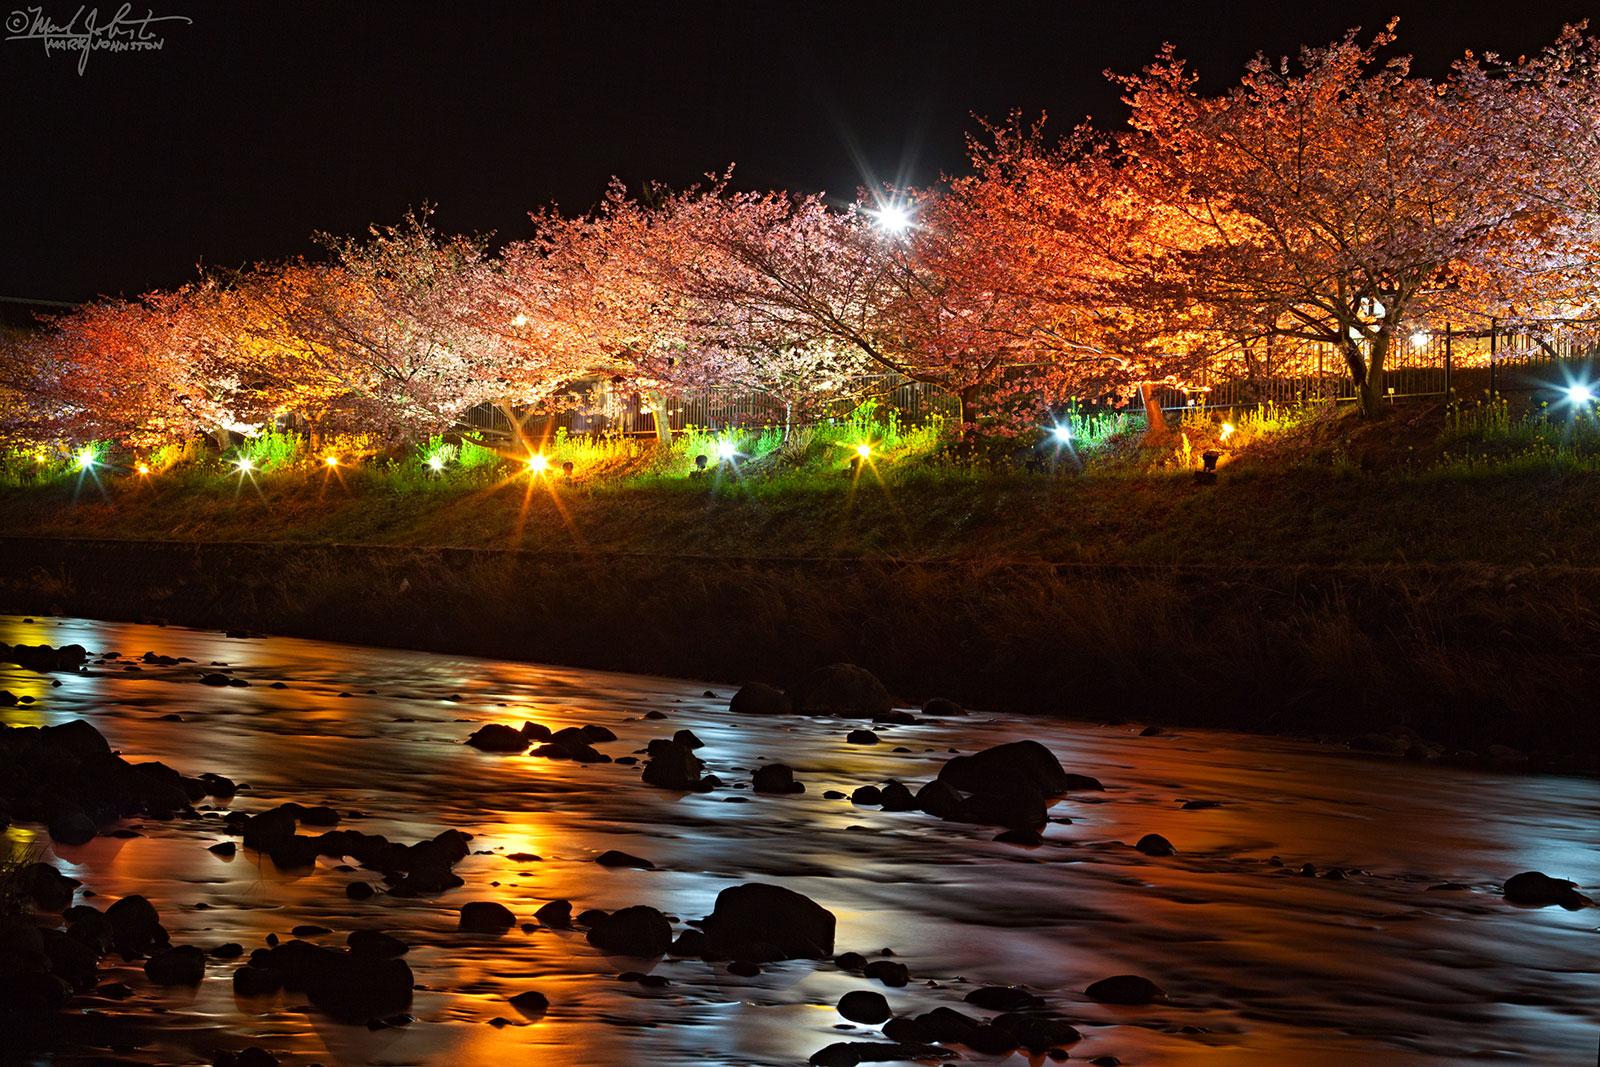 The trees are illuminated on certain evenings.